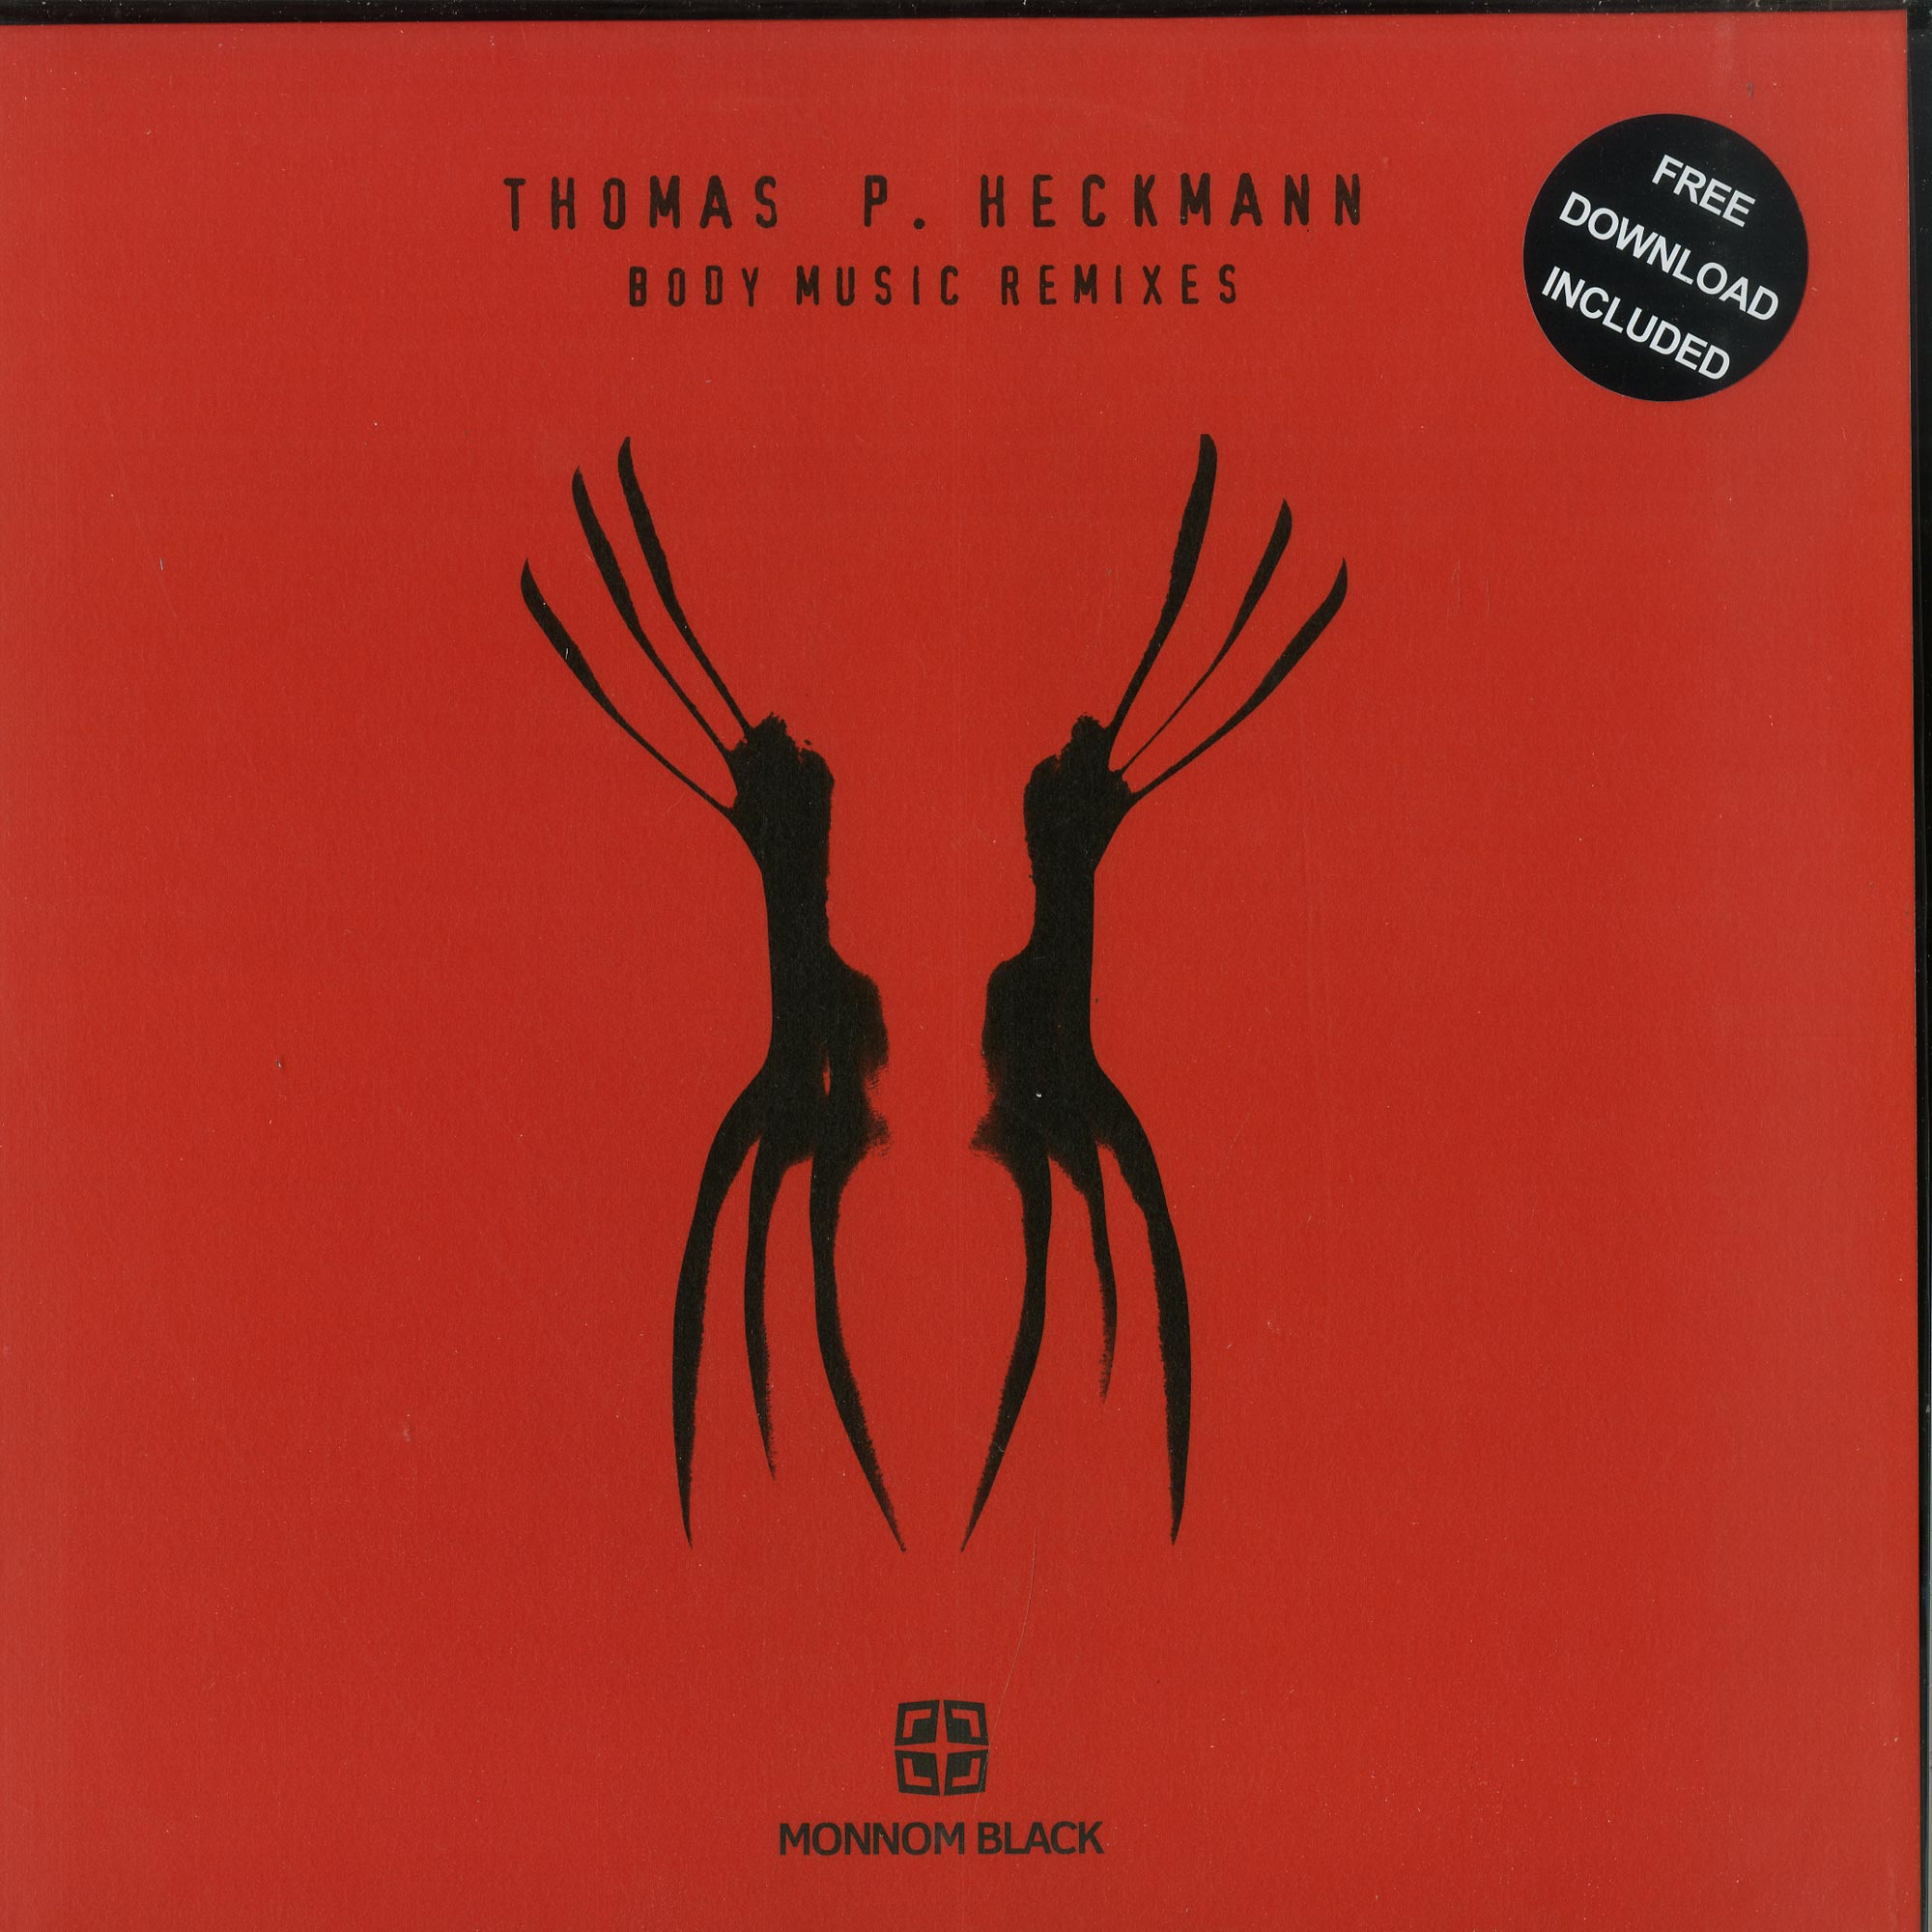 Thomas P. Heckmann - BODY MUSIC REMIXES